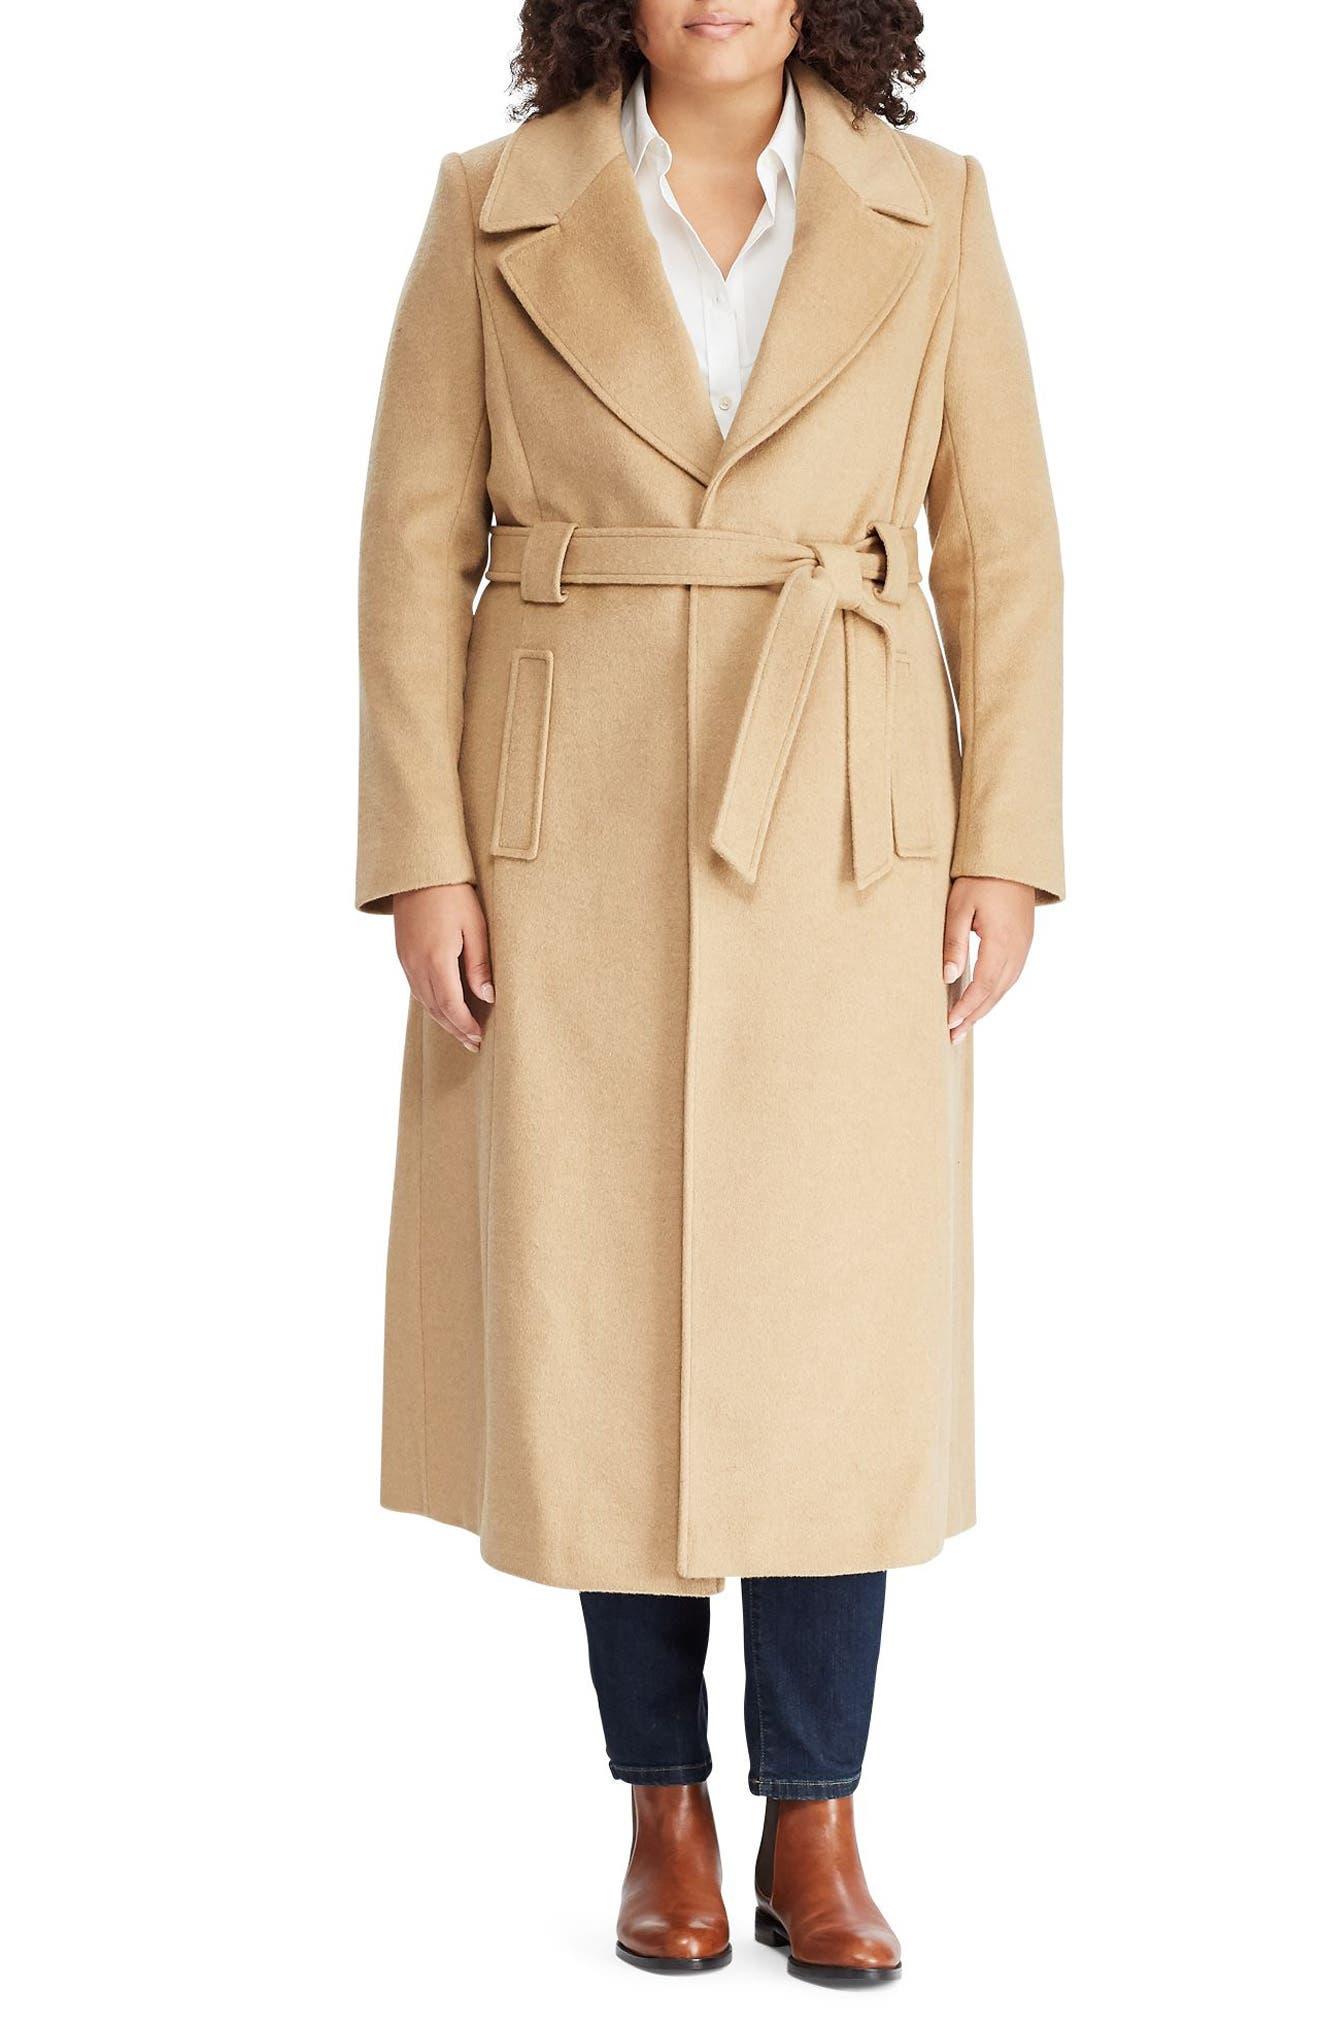 LAUREN RALPH LAUREN,                             Wool Blend Belted Wrap Coat,                             Main thumbnail 1, color,                             CAMEL